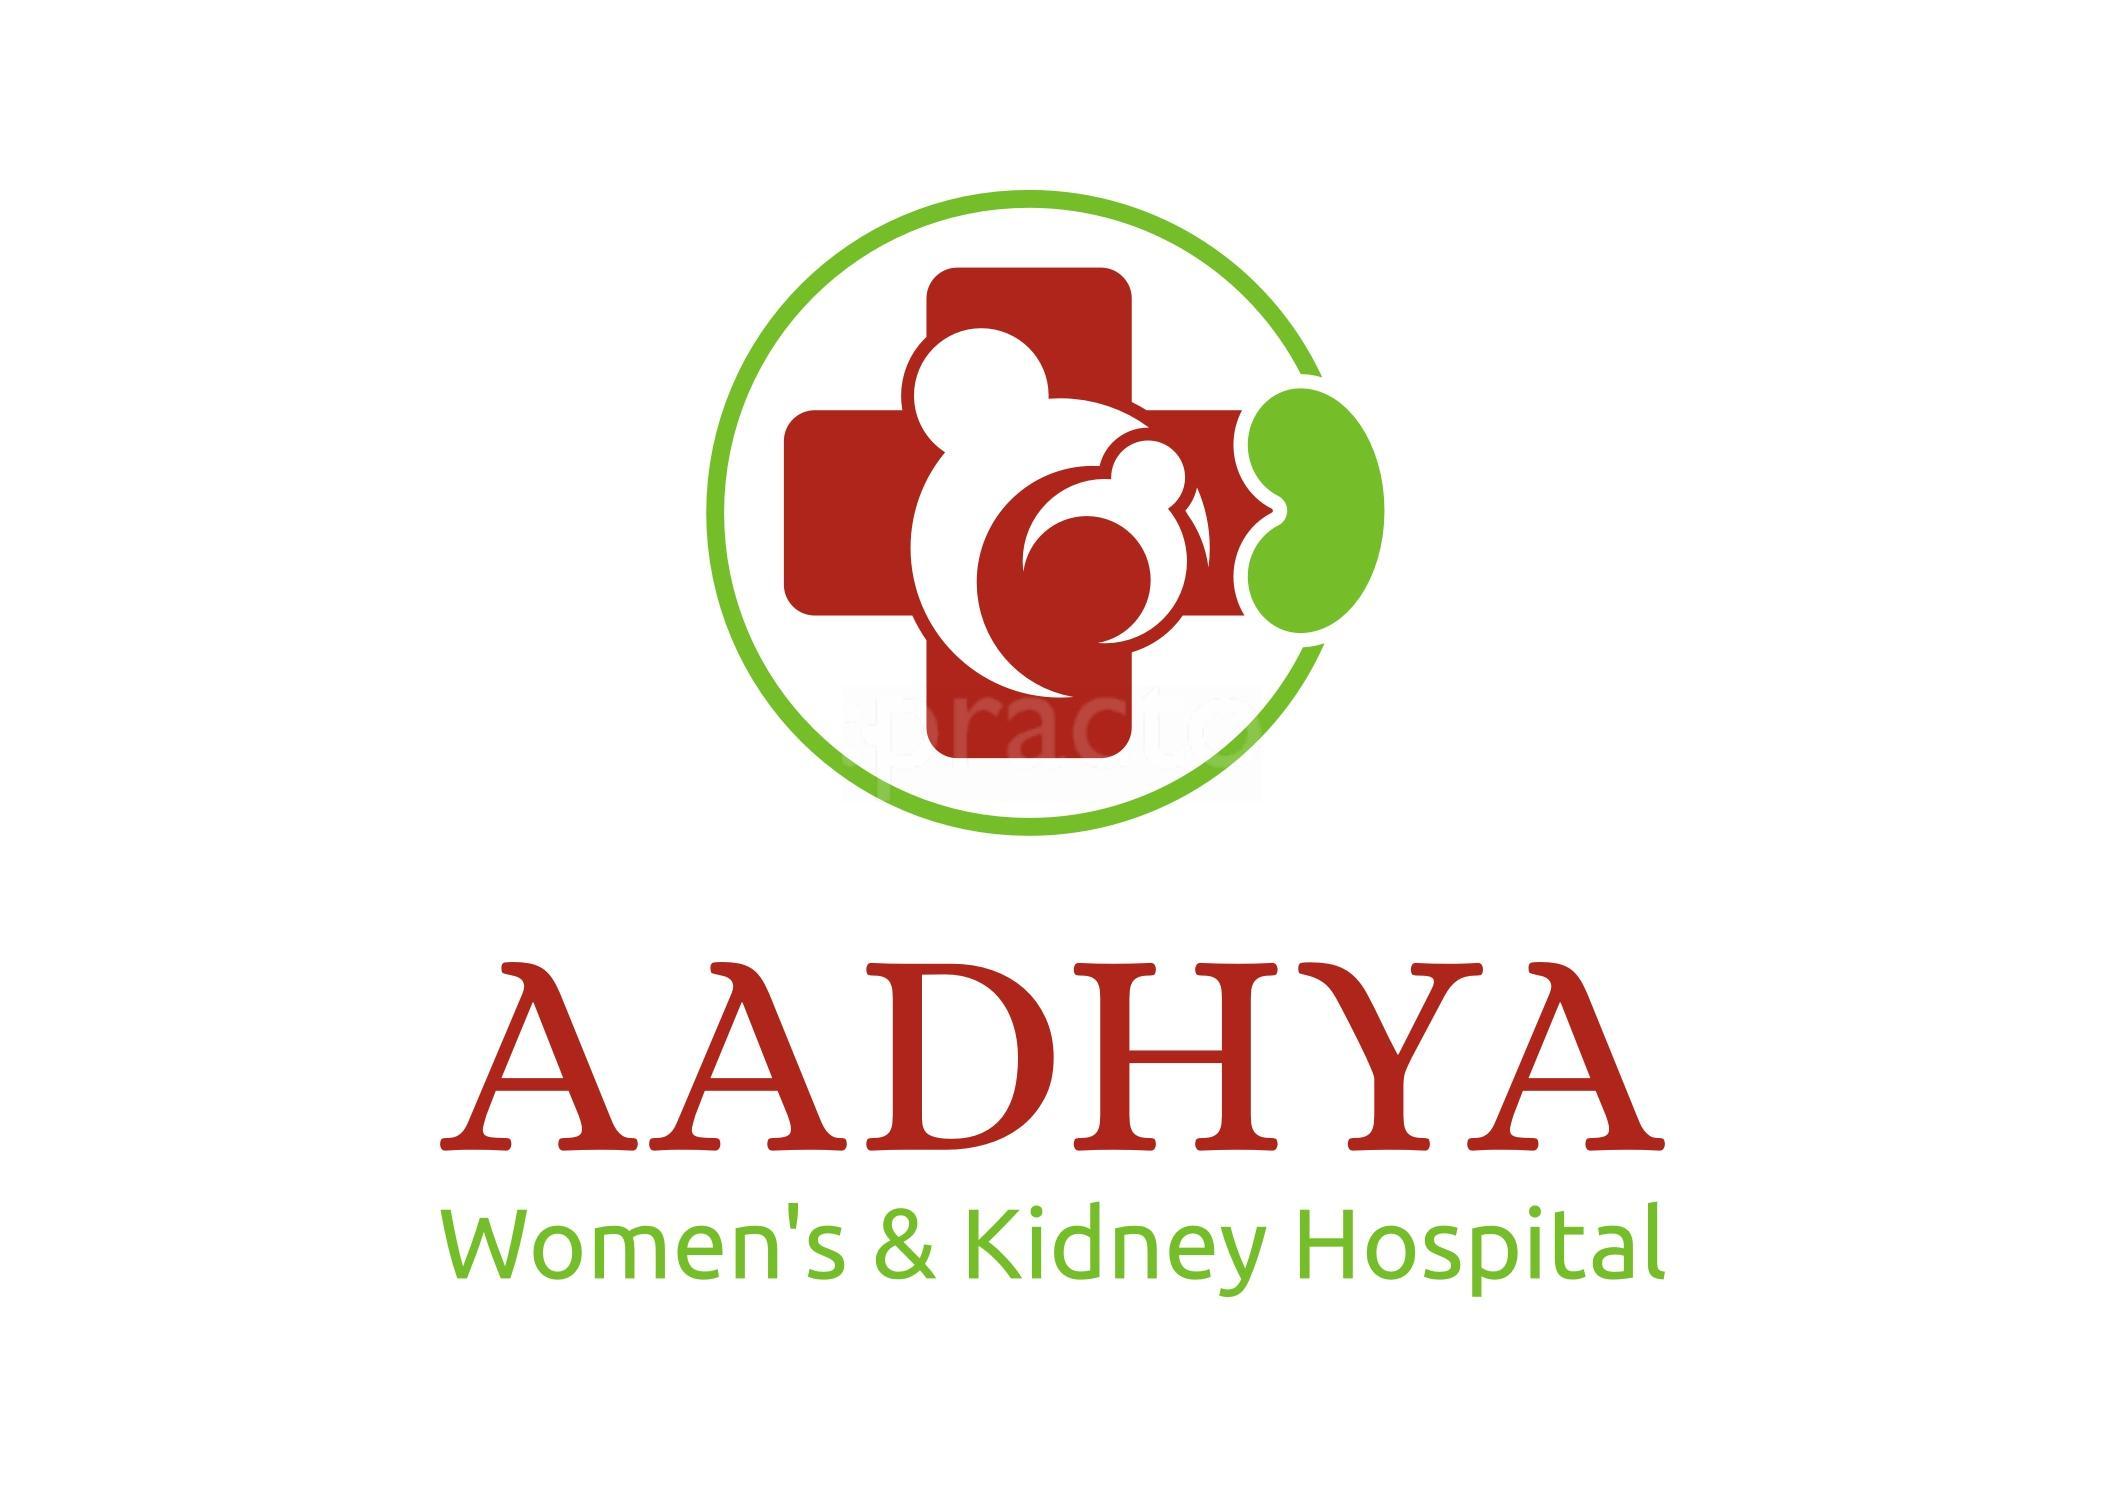 AADHYA Women's & Kidney Hospital